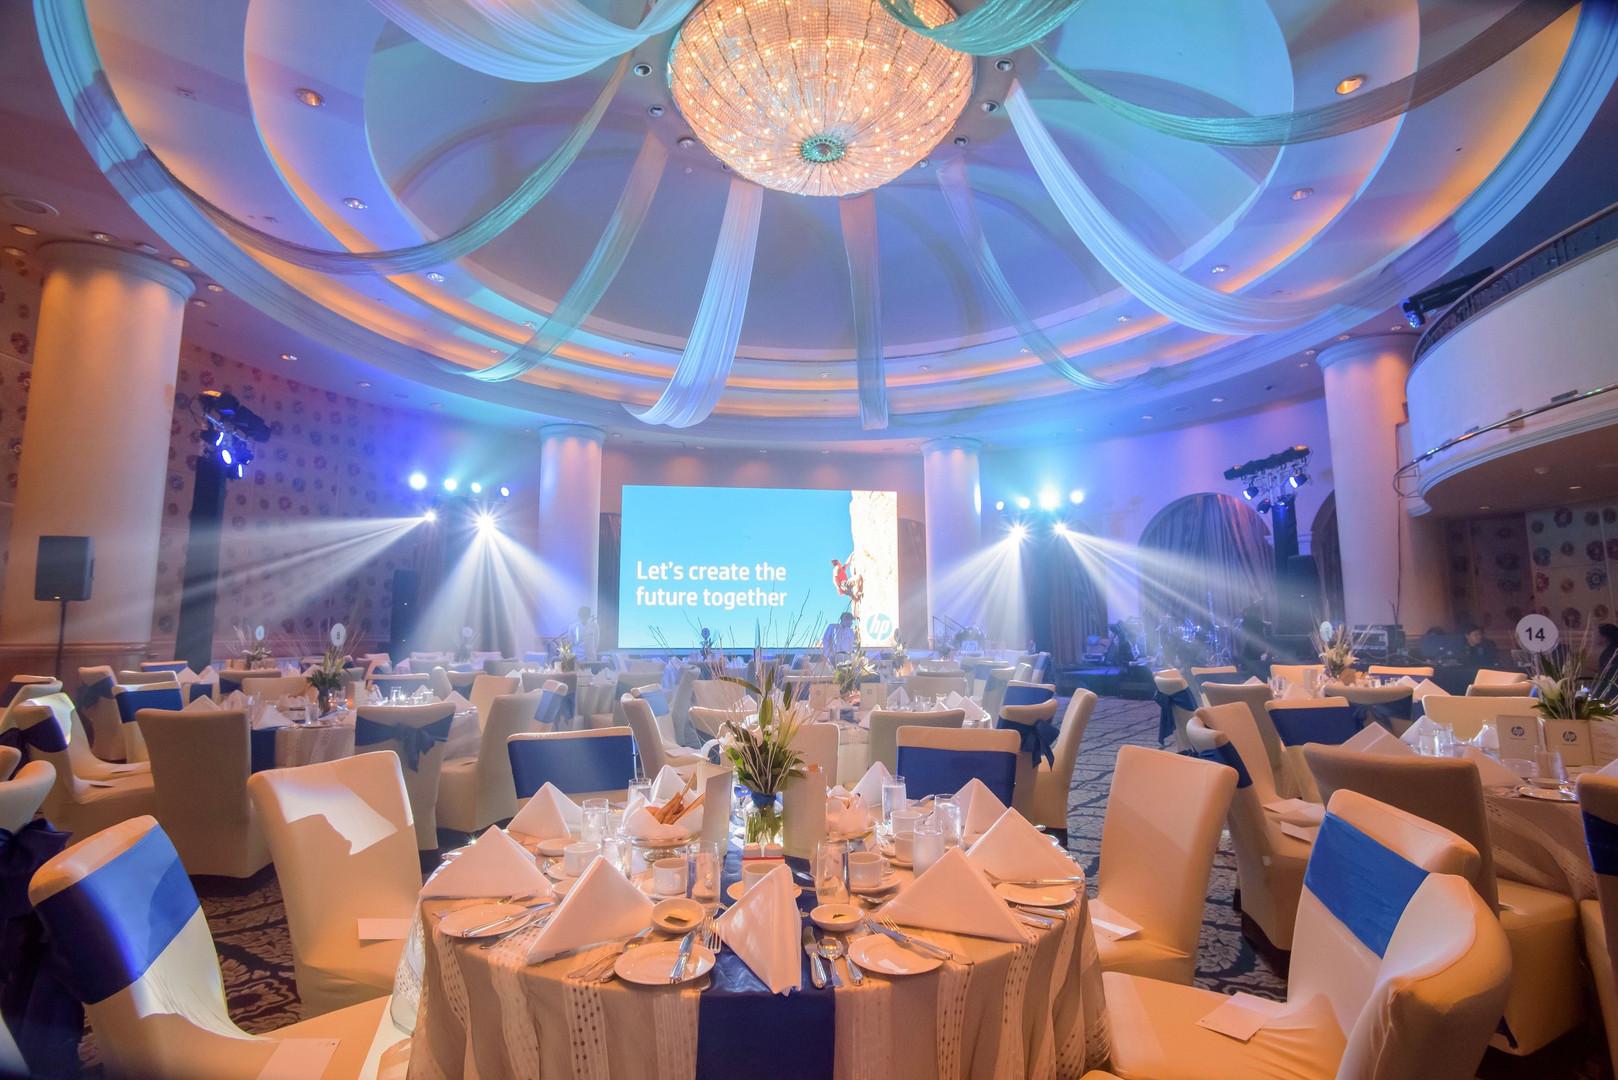 SEA theme event production 5.jpg